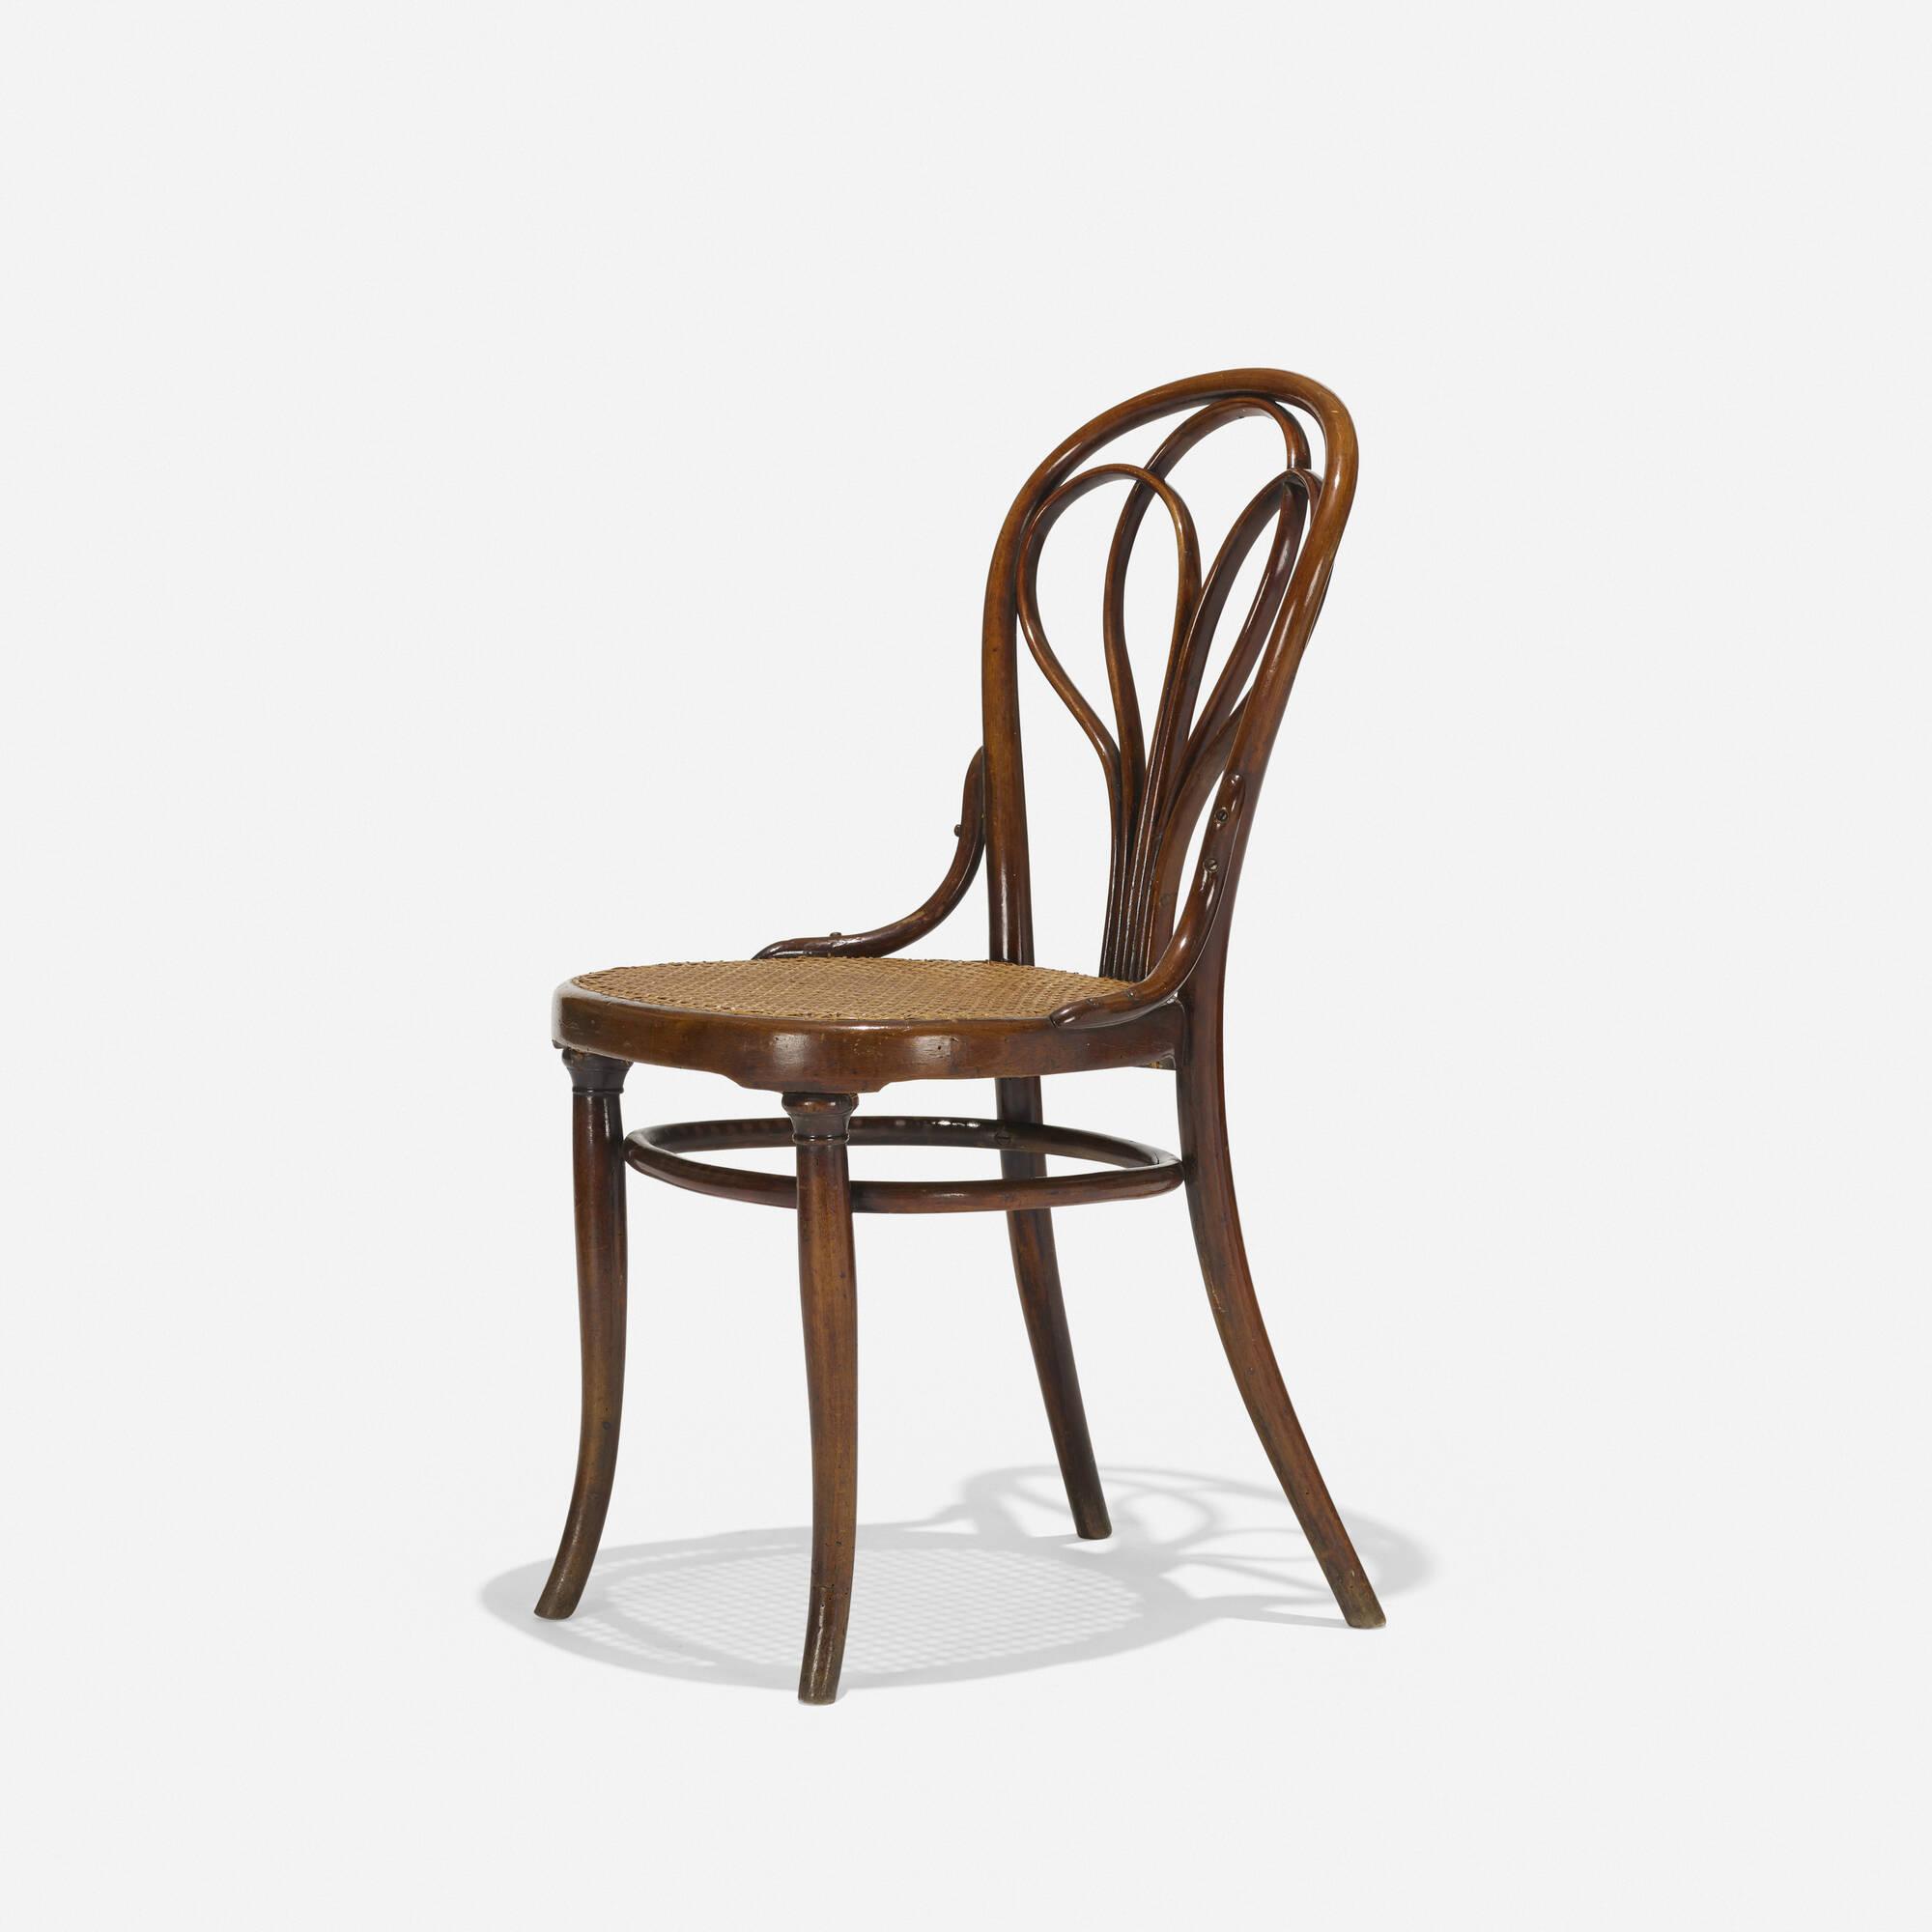 410: Gebrüder Thonet / chair, model no. 25 (2 of 3)